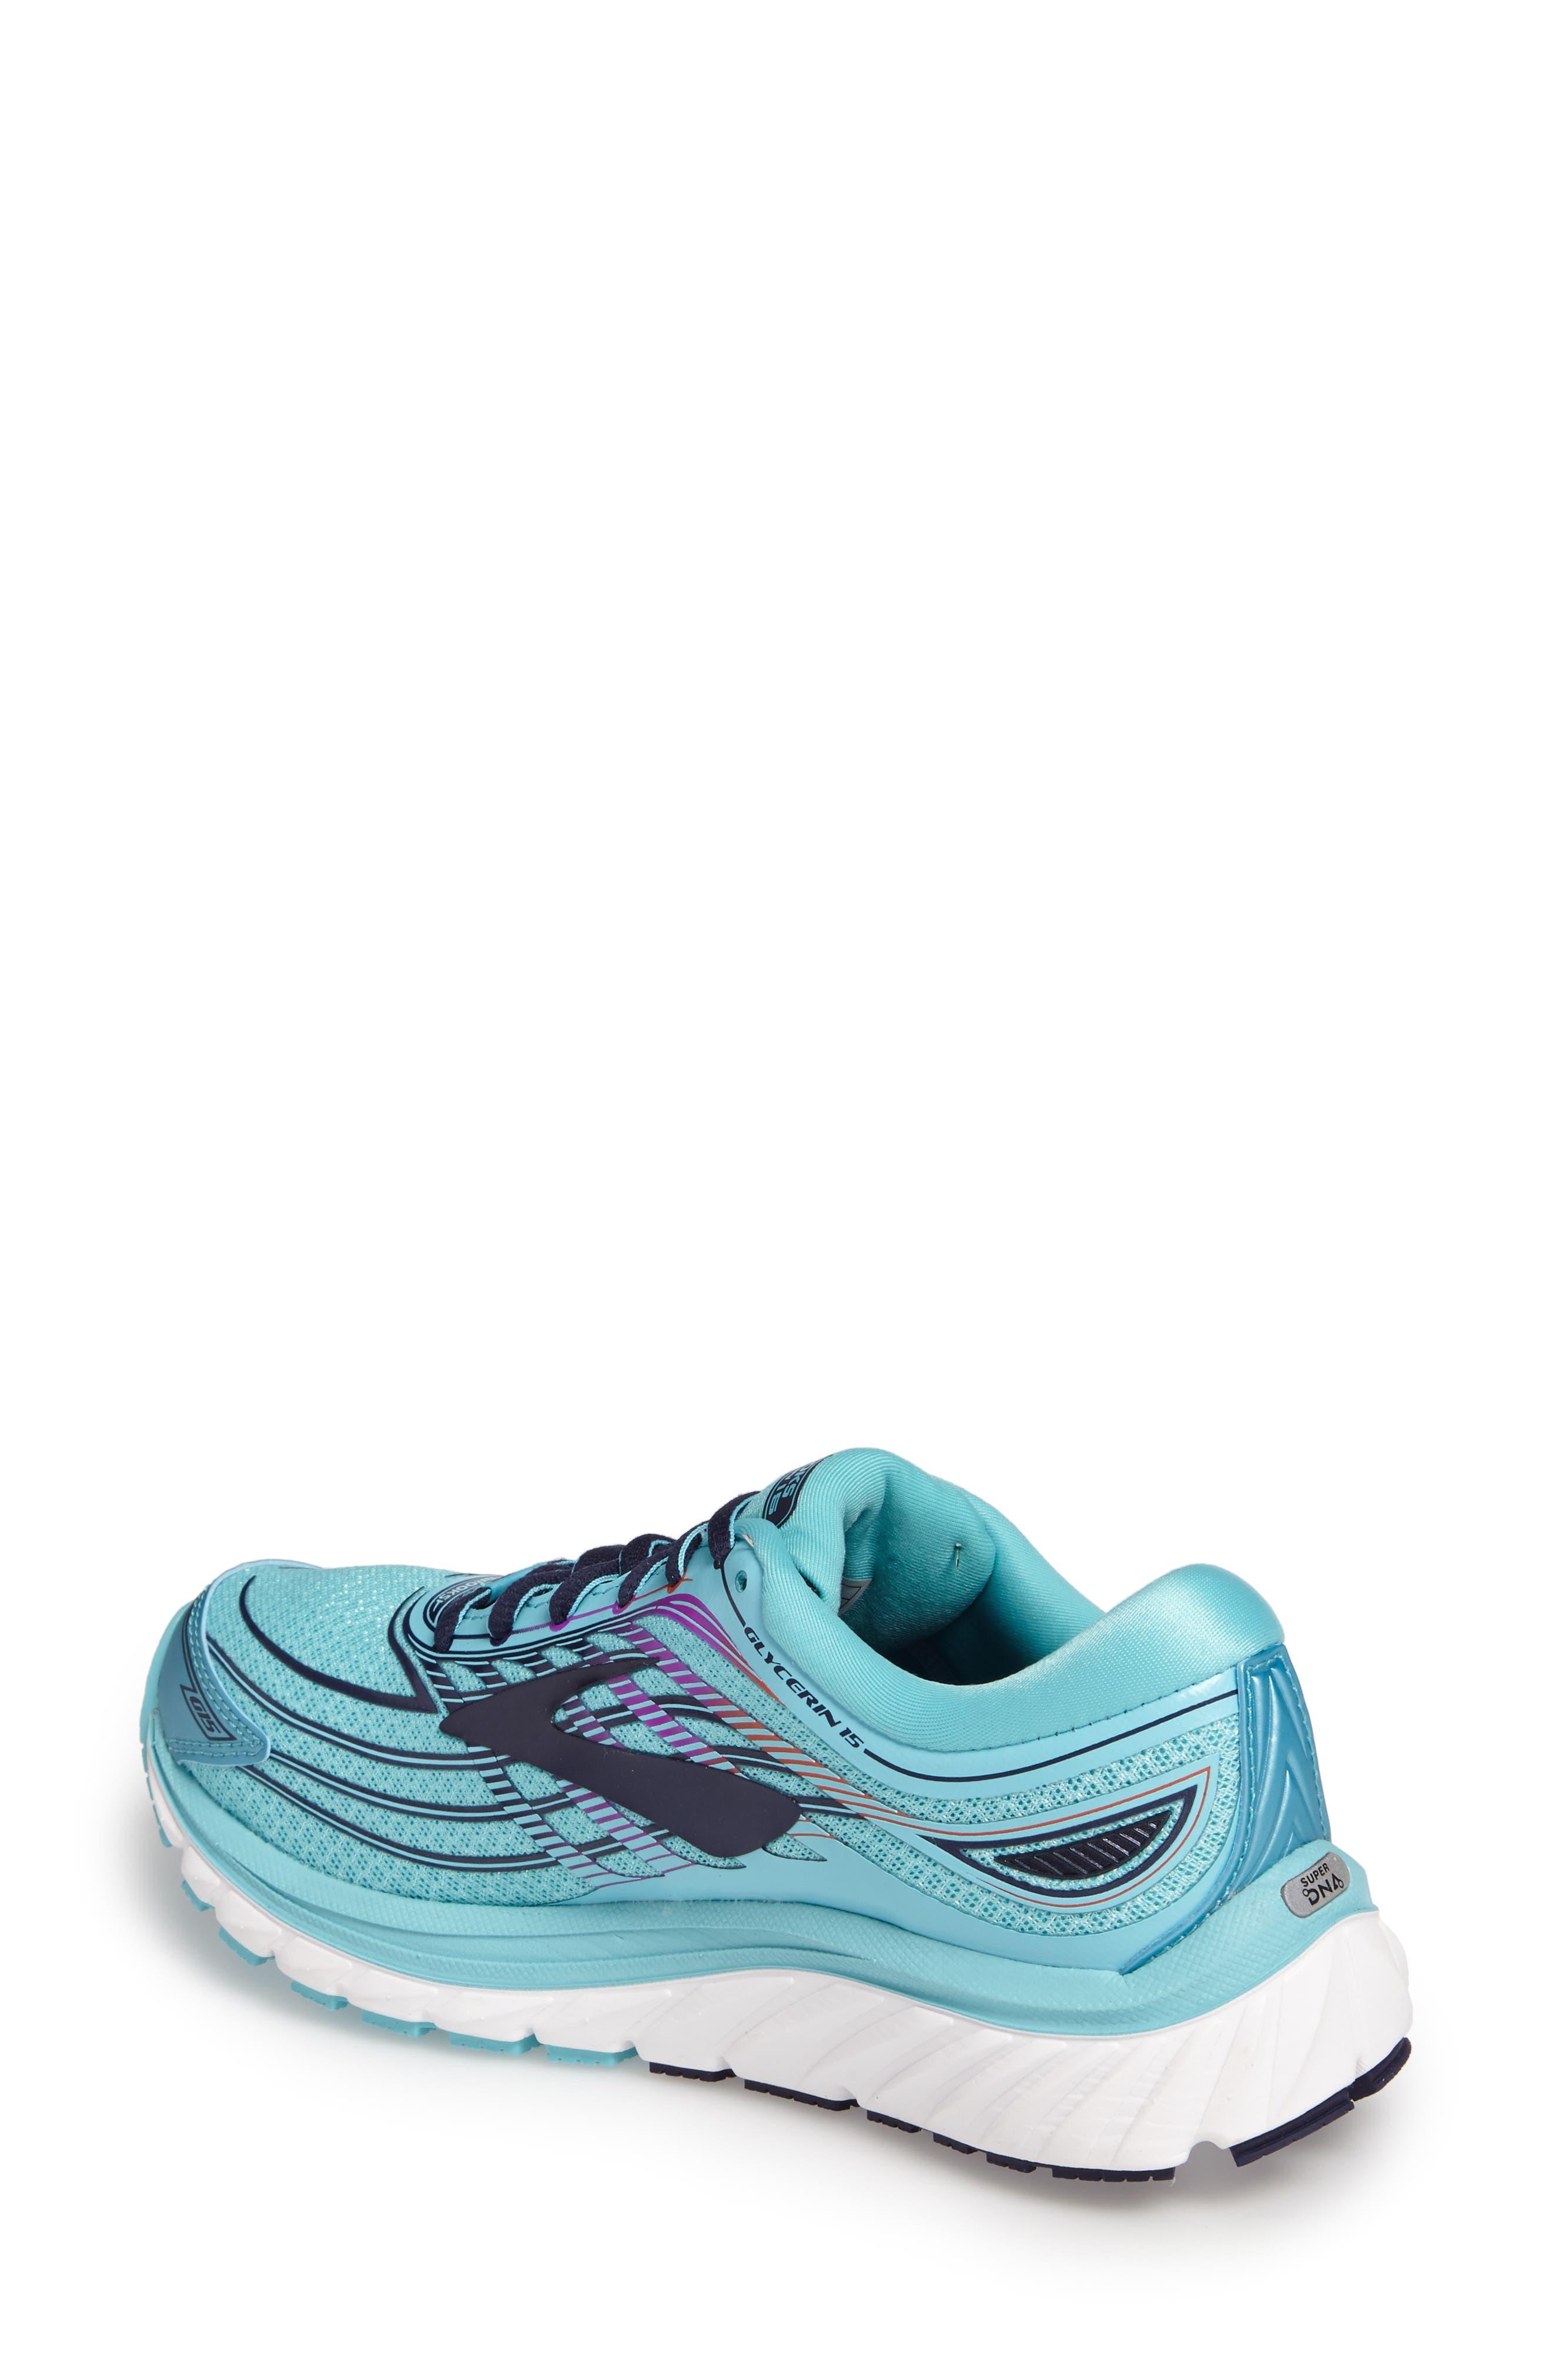 Glycerin 15 Running Shoe,                             Alternate thumbnail 8, color,